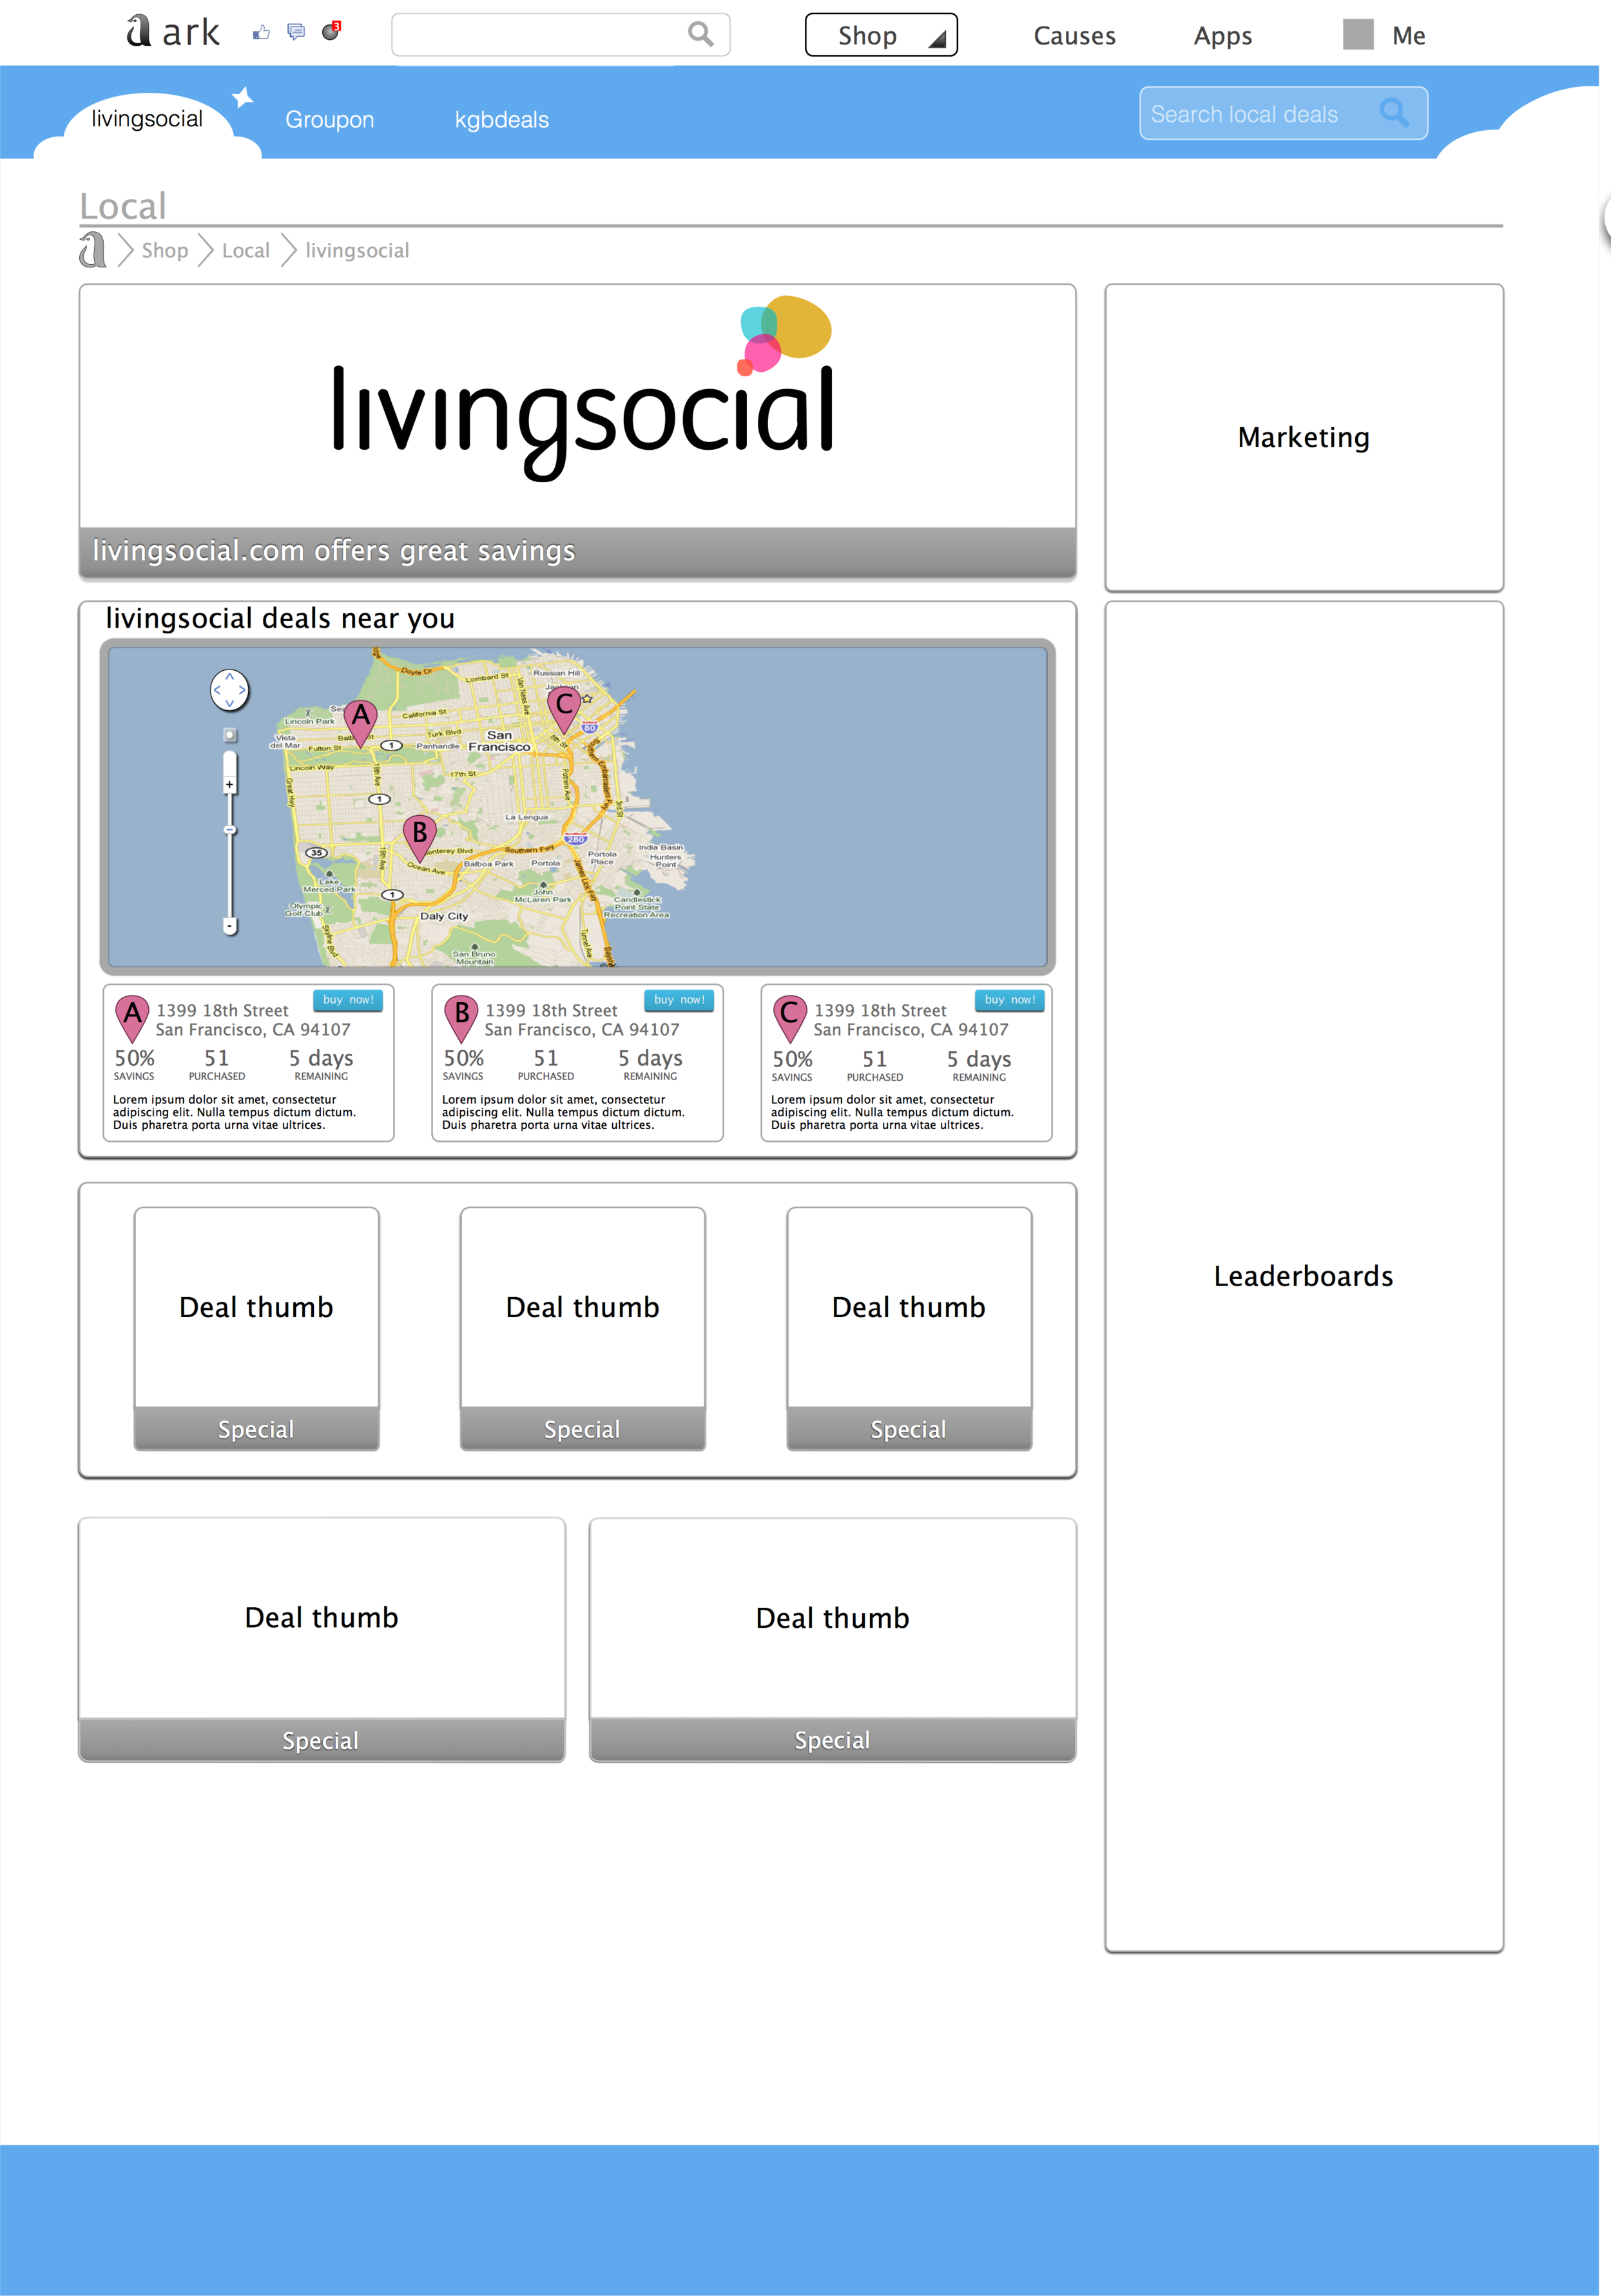 Livingsocial Local